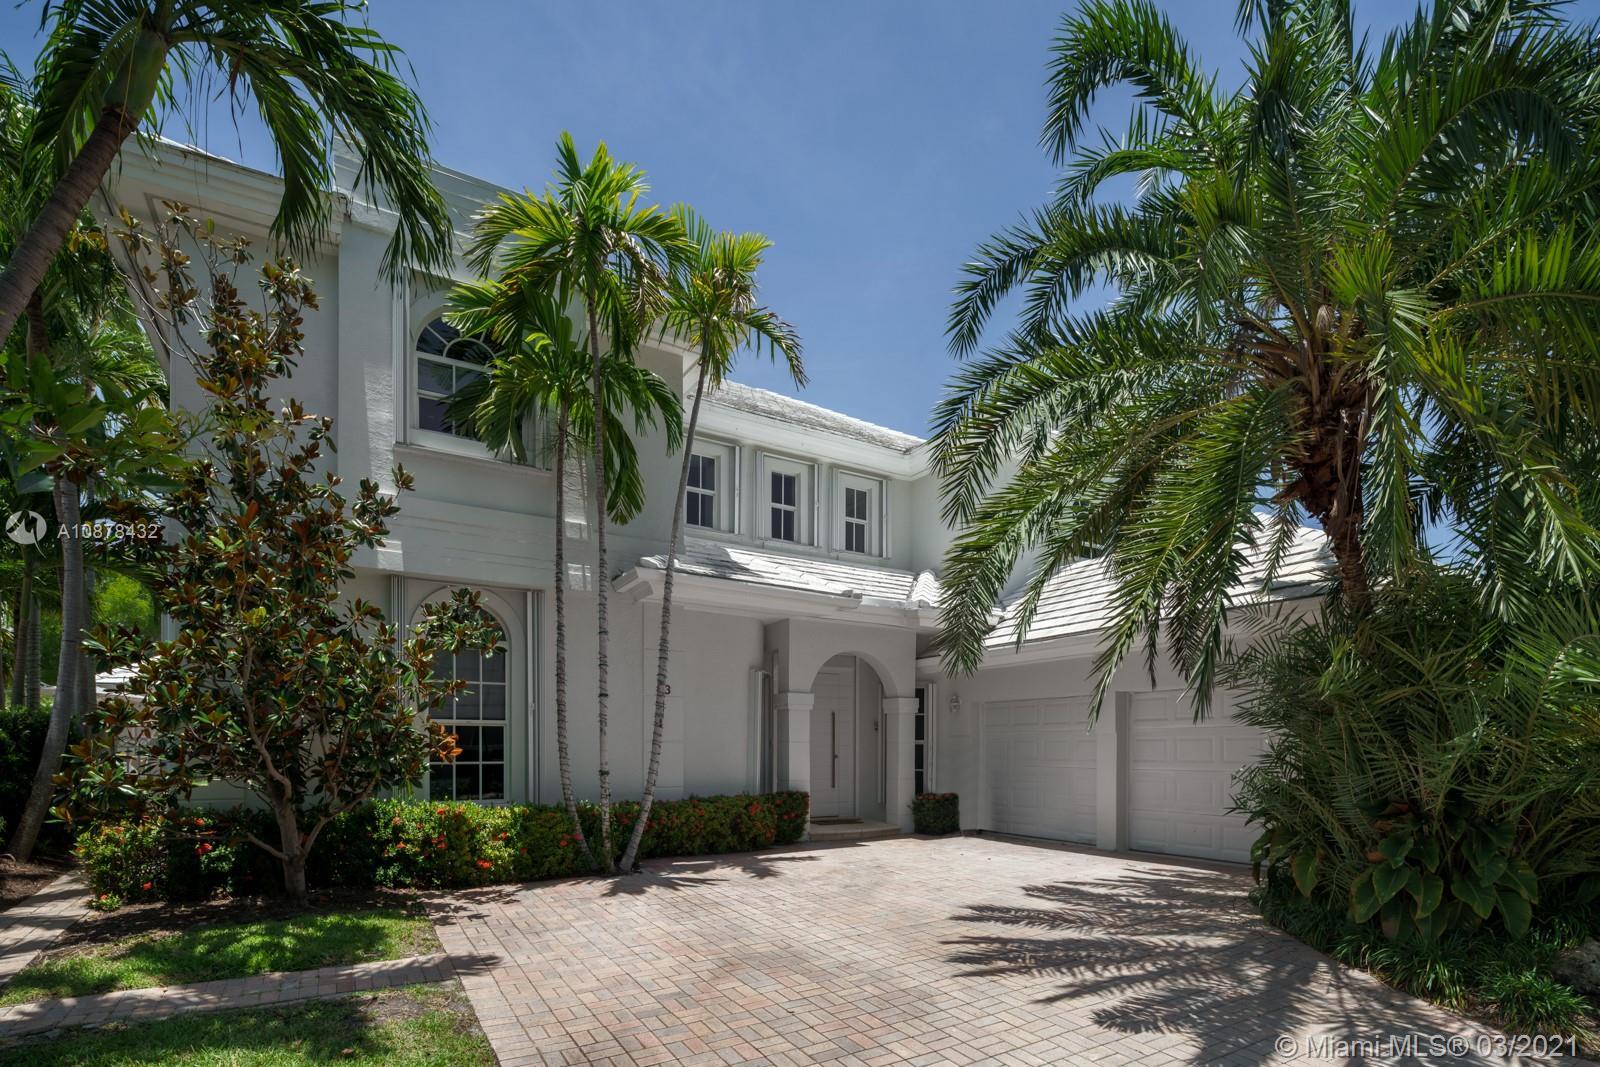 Real Estate Photo A10878432